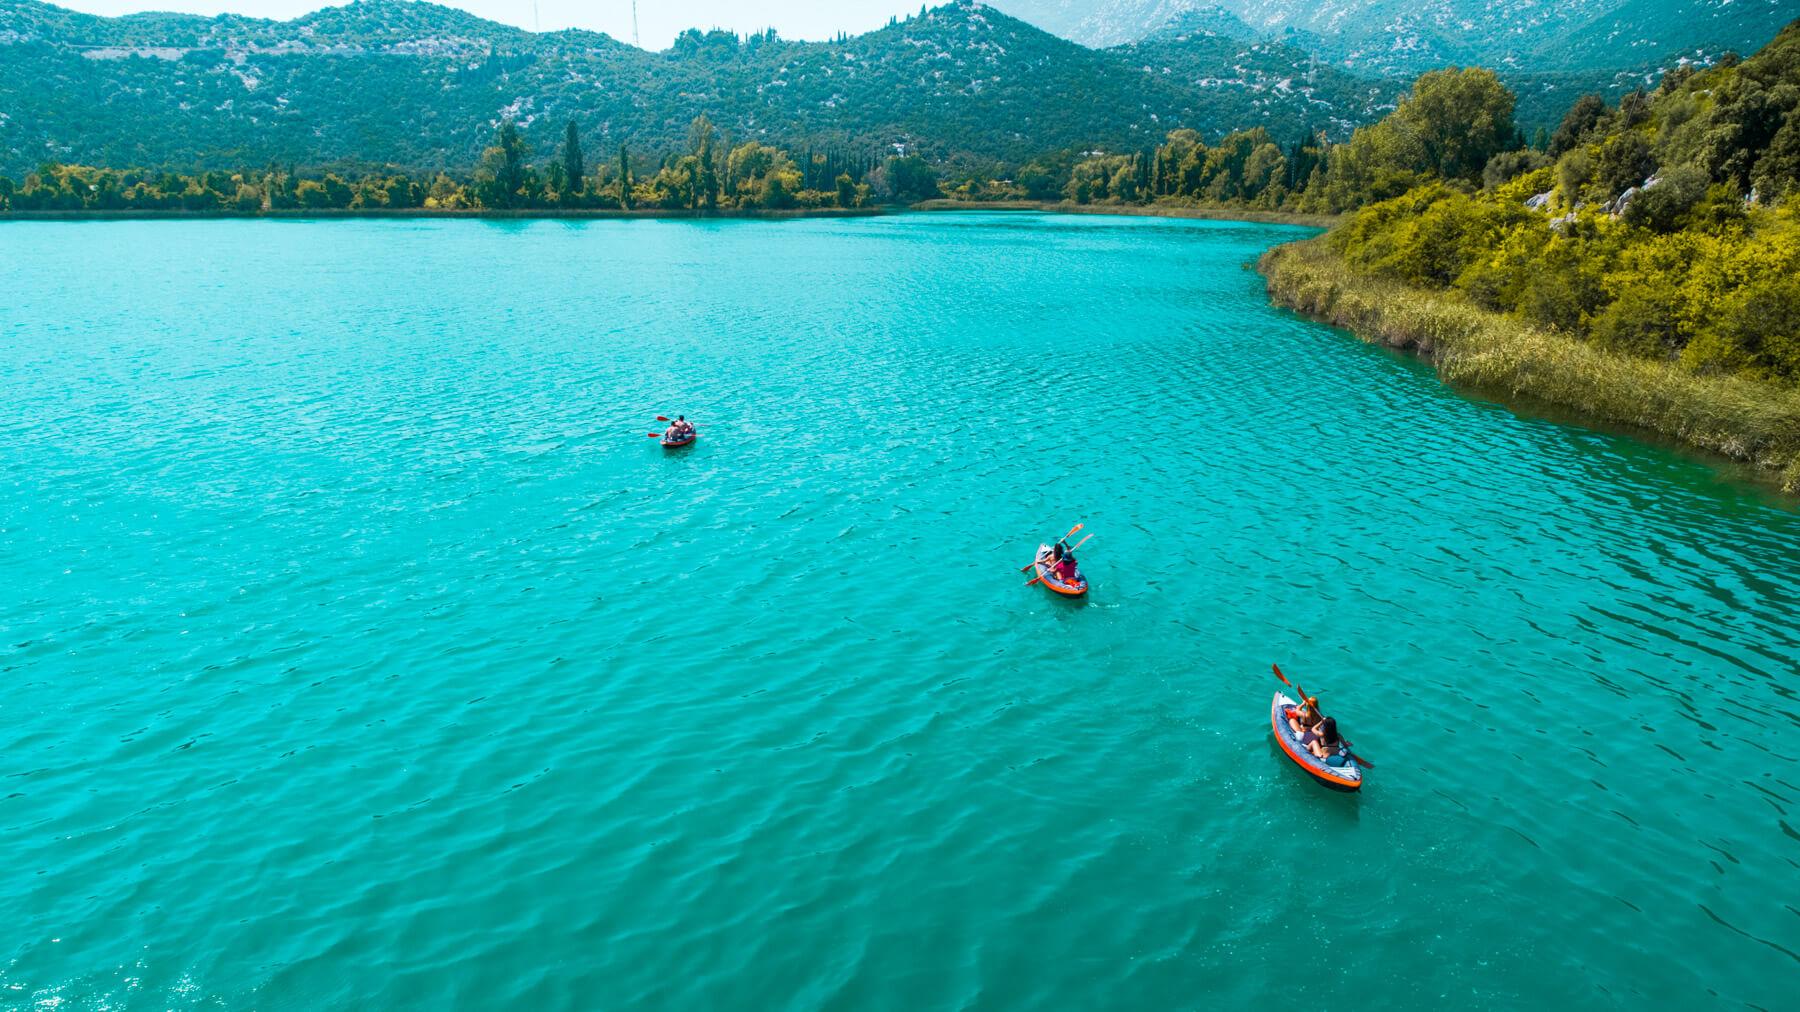 drone-view-on-kayakers-on-bacina-lakes